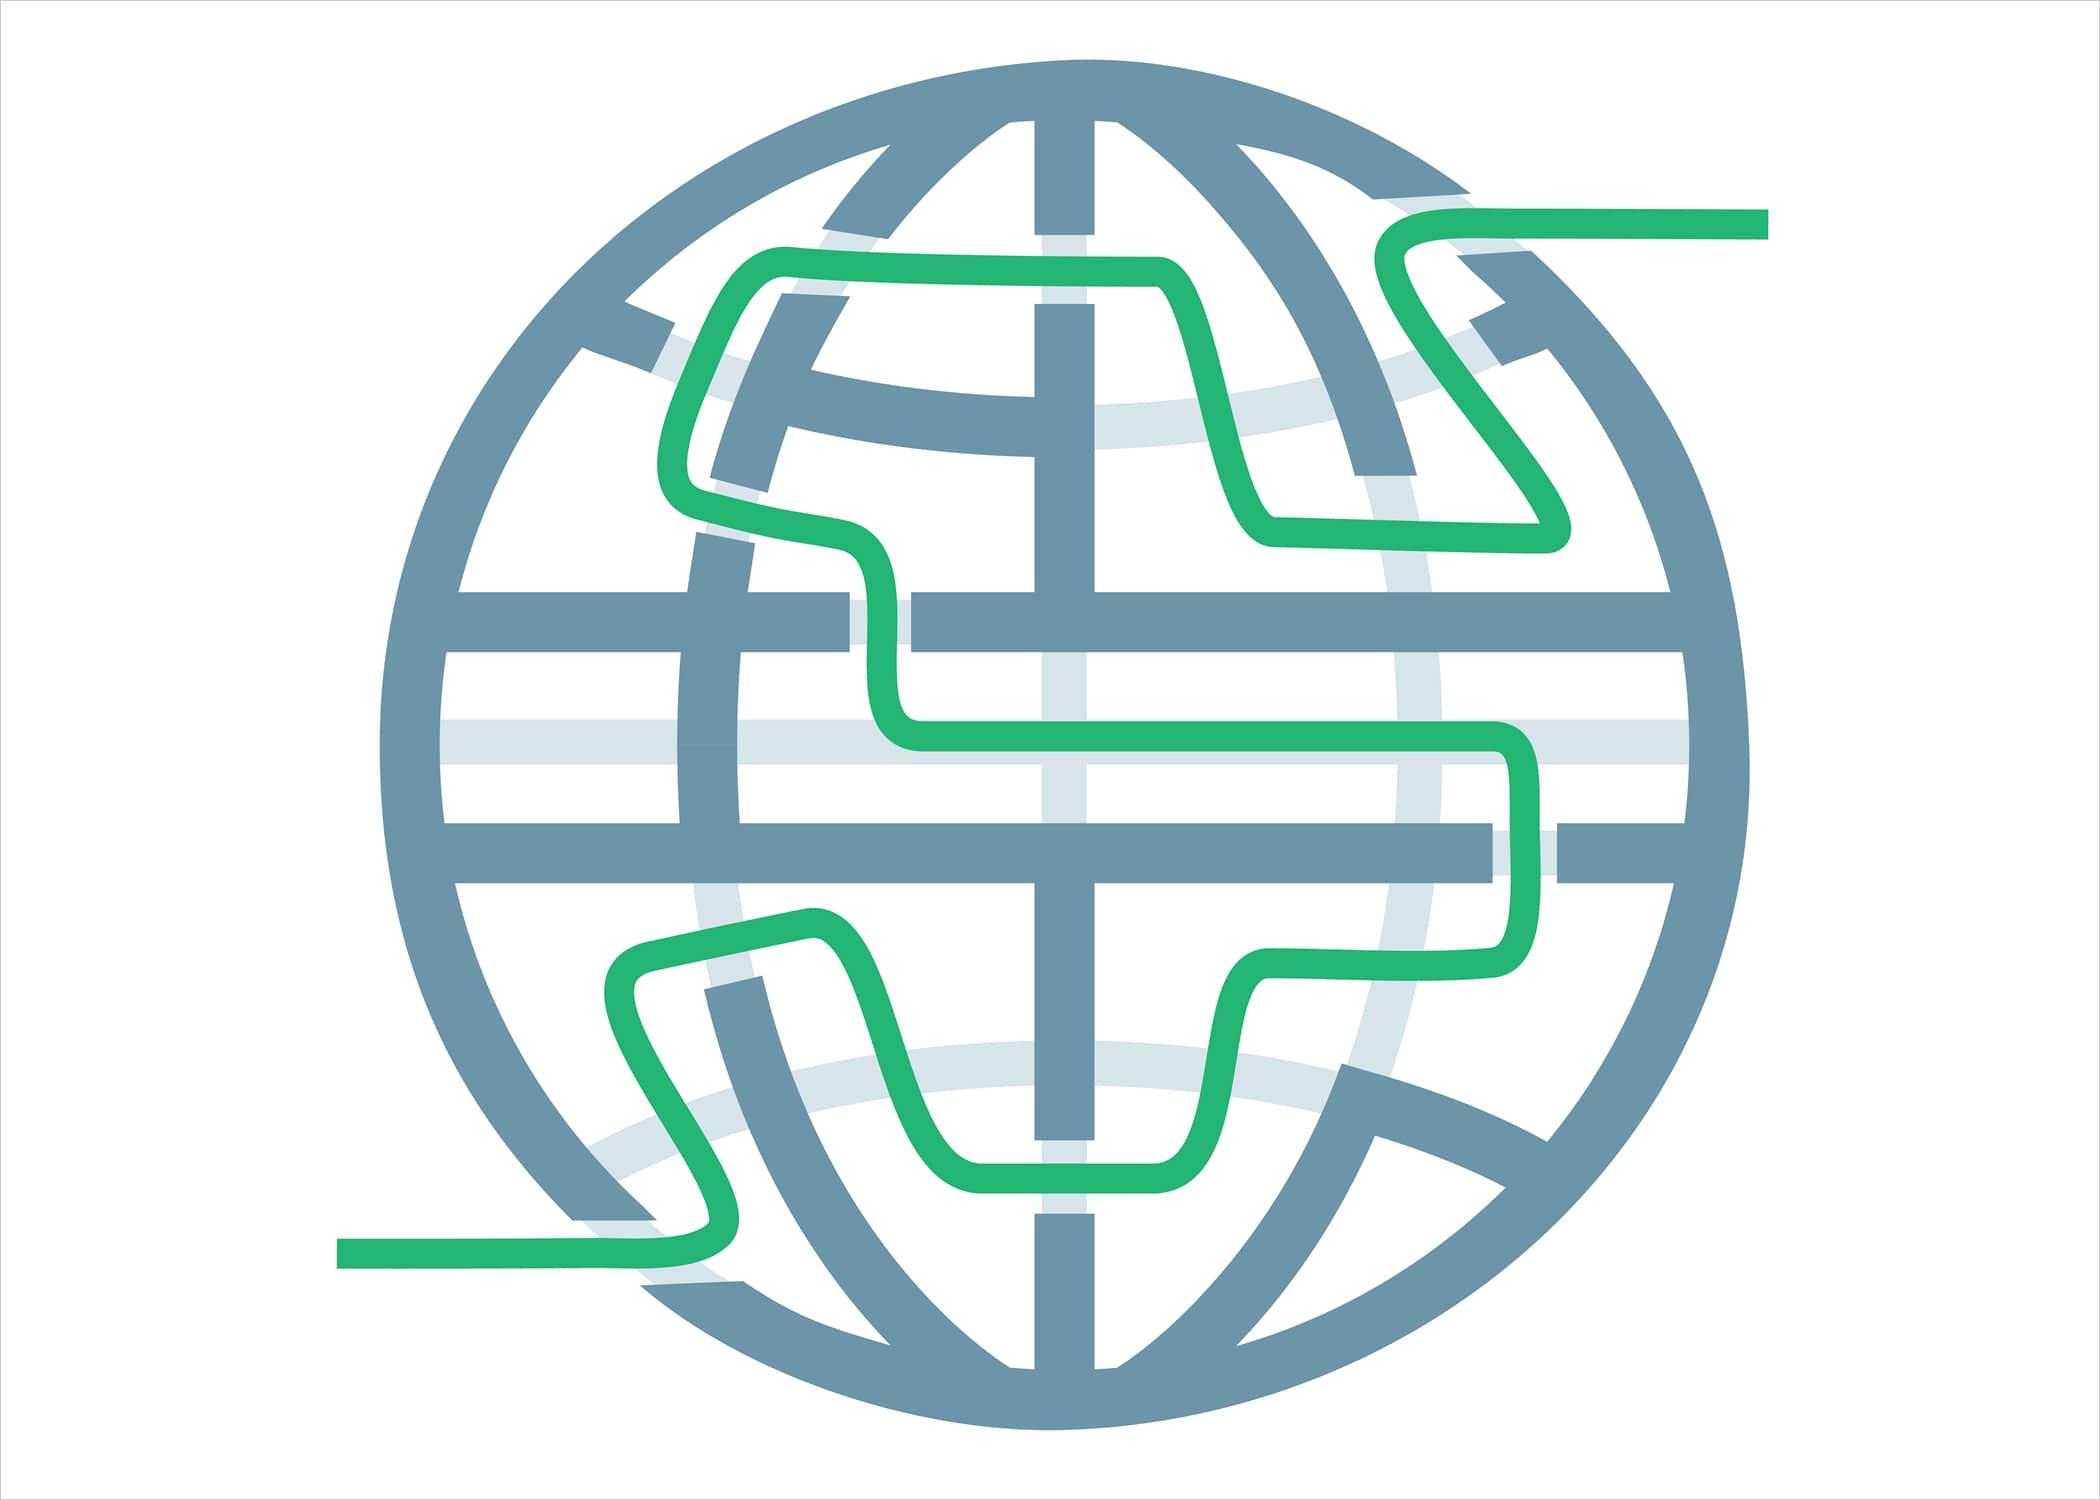 naem-webinar-2016-regulatory-changes-ahead-preparing-for-psm-and-rmp-updates-700x500